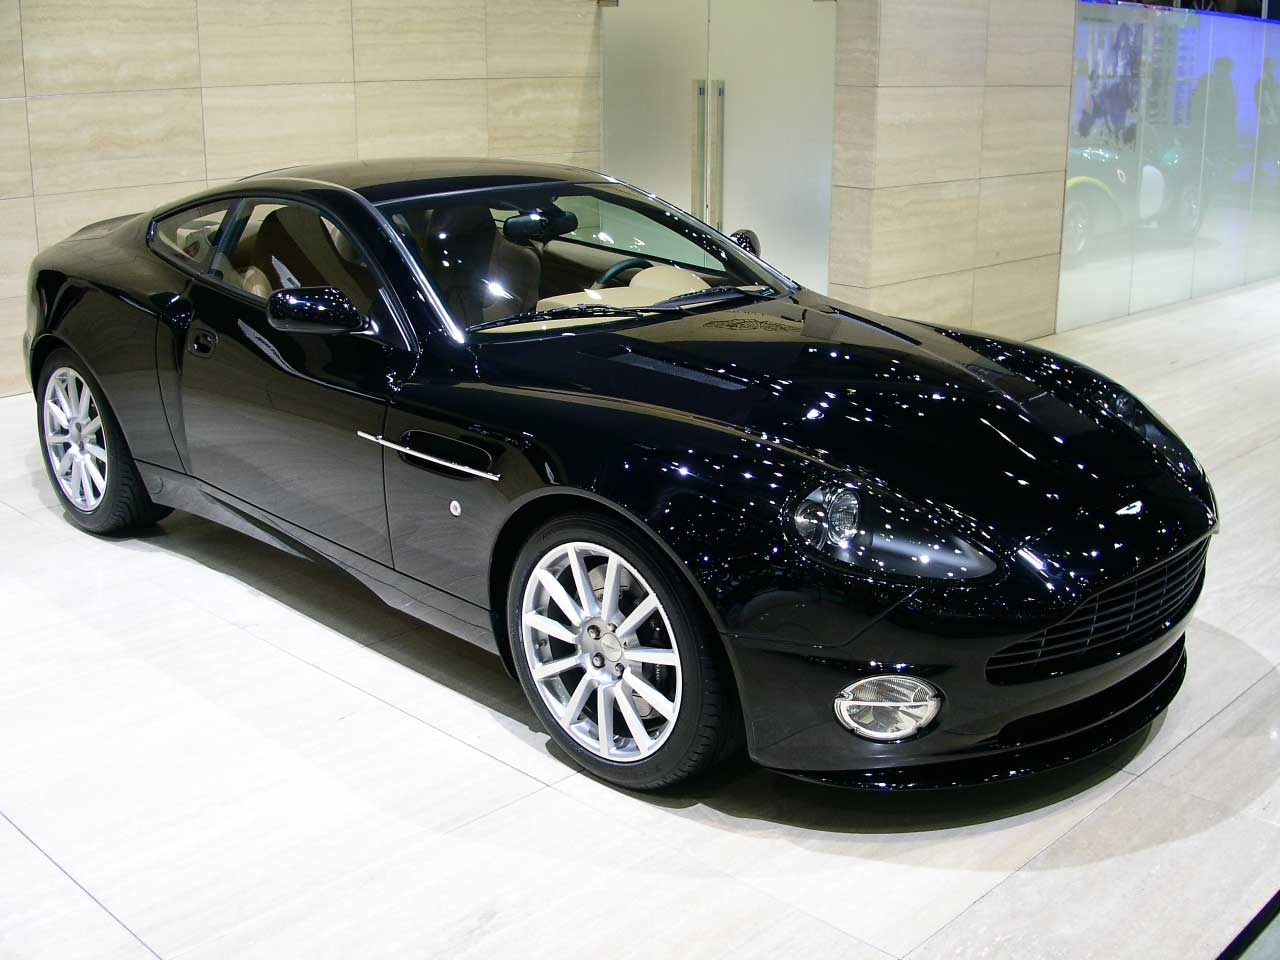 Aston Martin V Vanquish Overview CarGurus - 2006 aston martin vanquish price